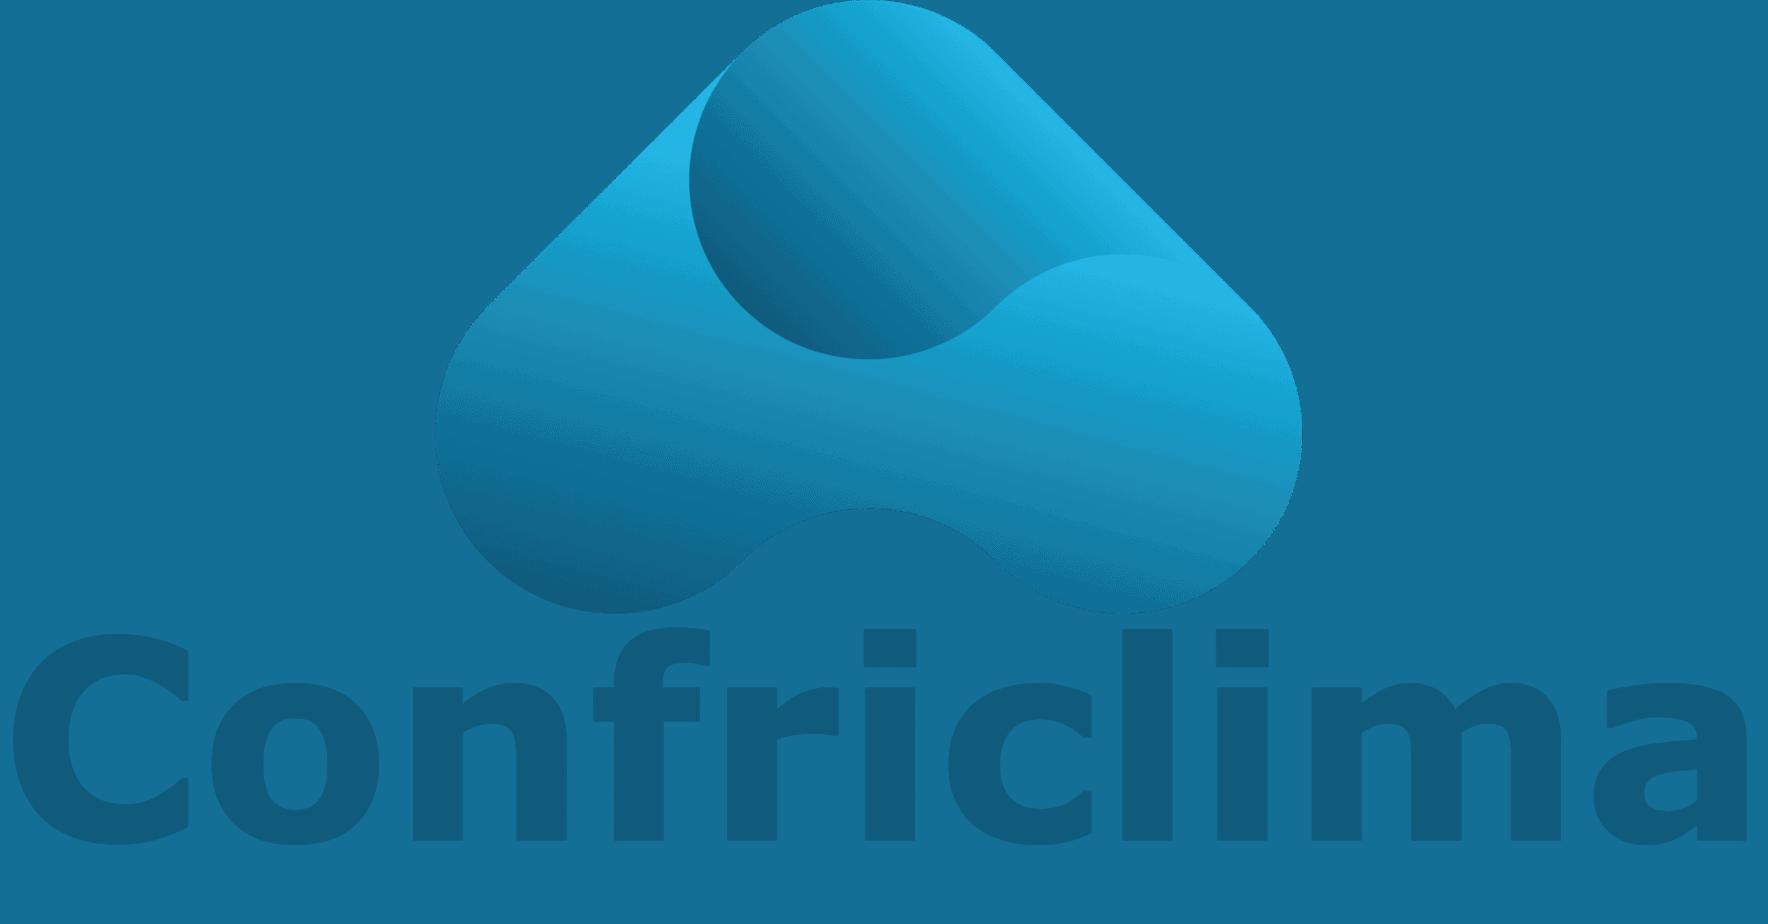 Confriclima climatización e instalaciones en Madrid